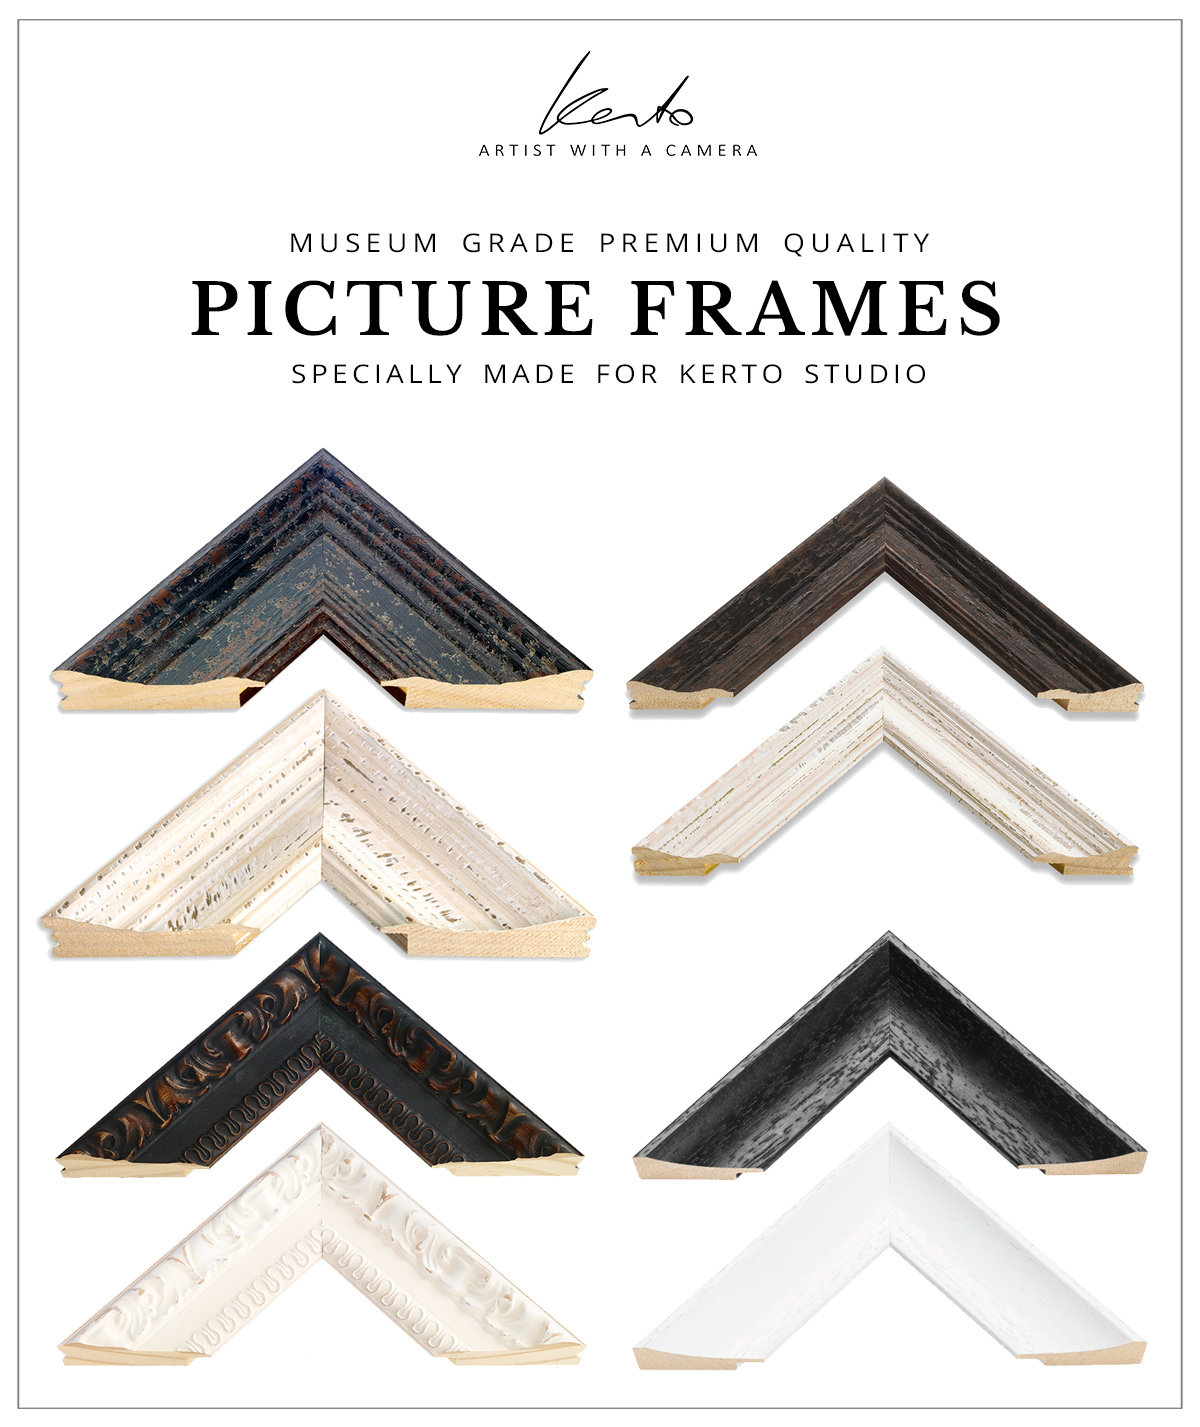 Kerto Studio picture frames